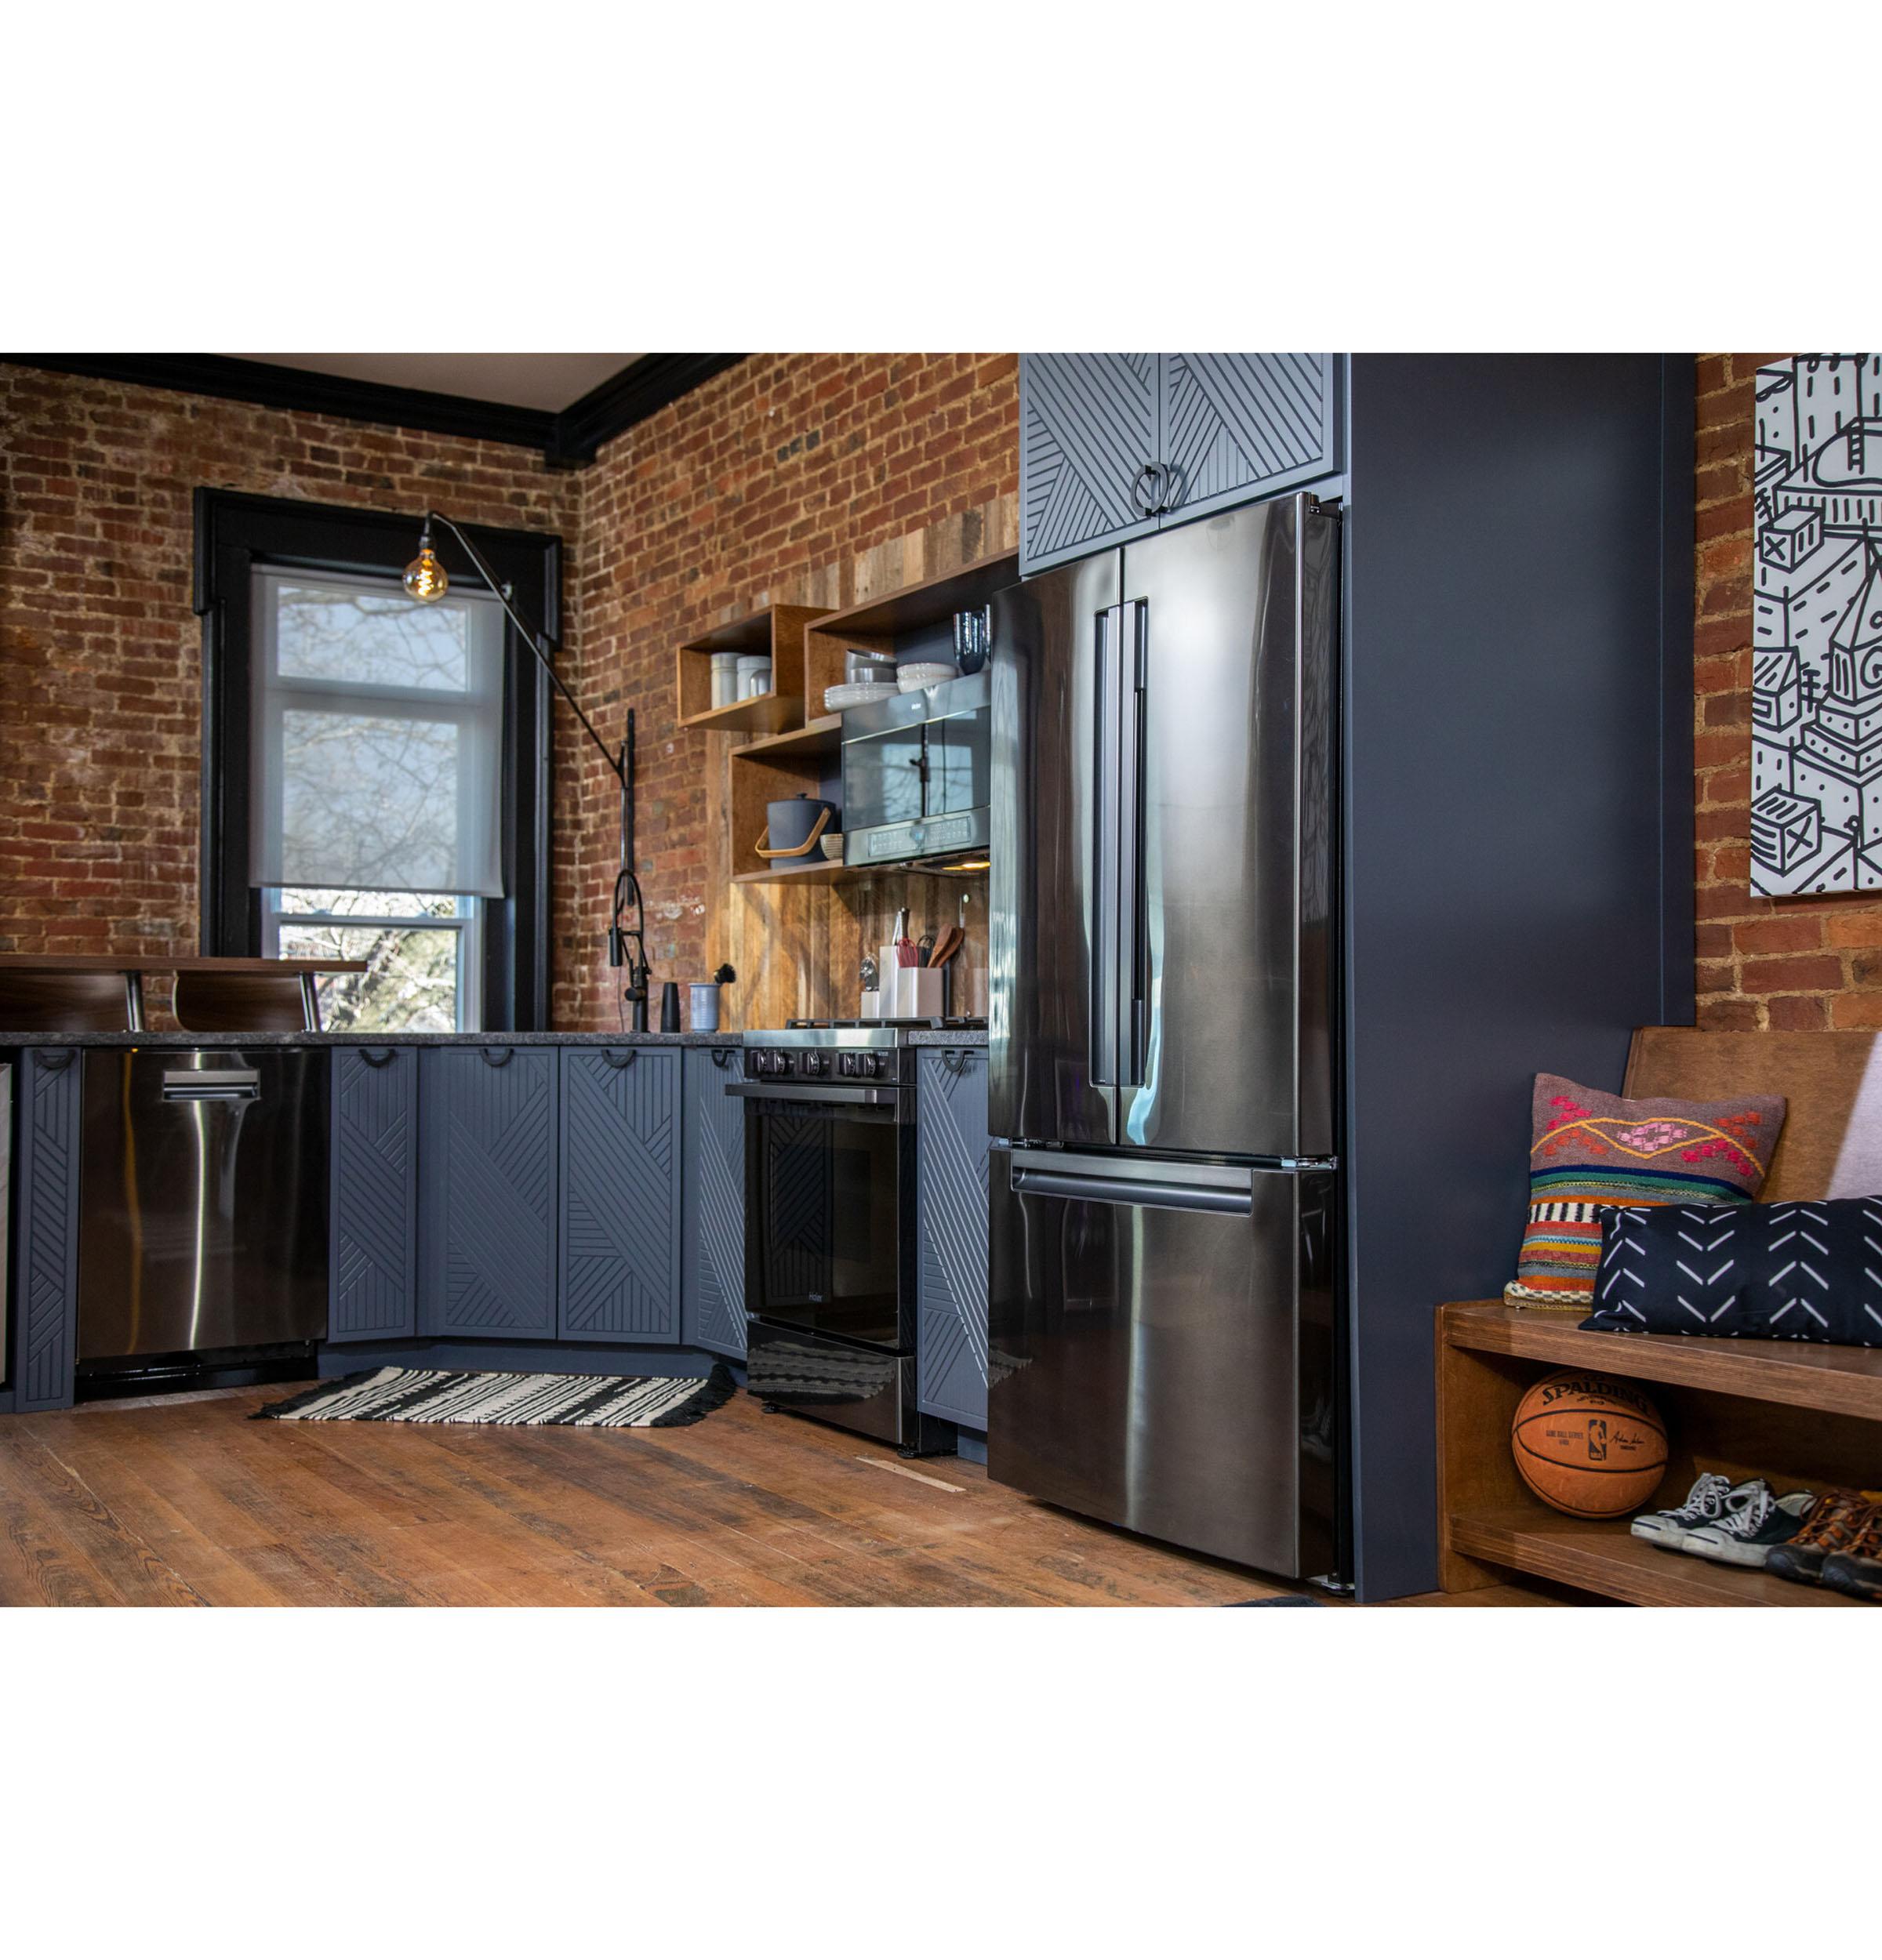 Model: QNE27JBMTS | Haier ENERGY STAR® 27.0 Cu. Ft. French-Door Refrigerator